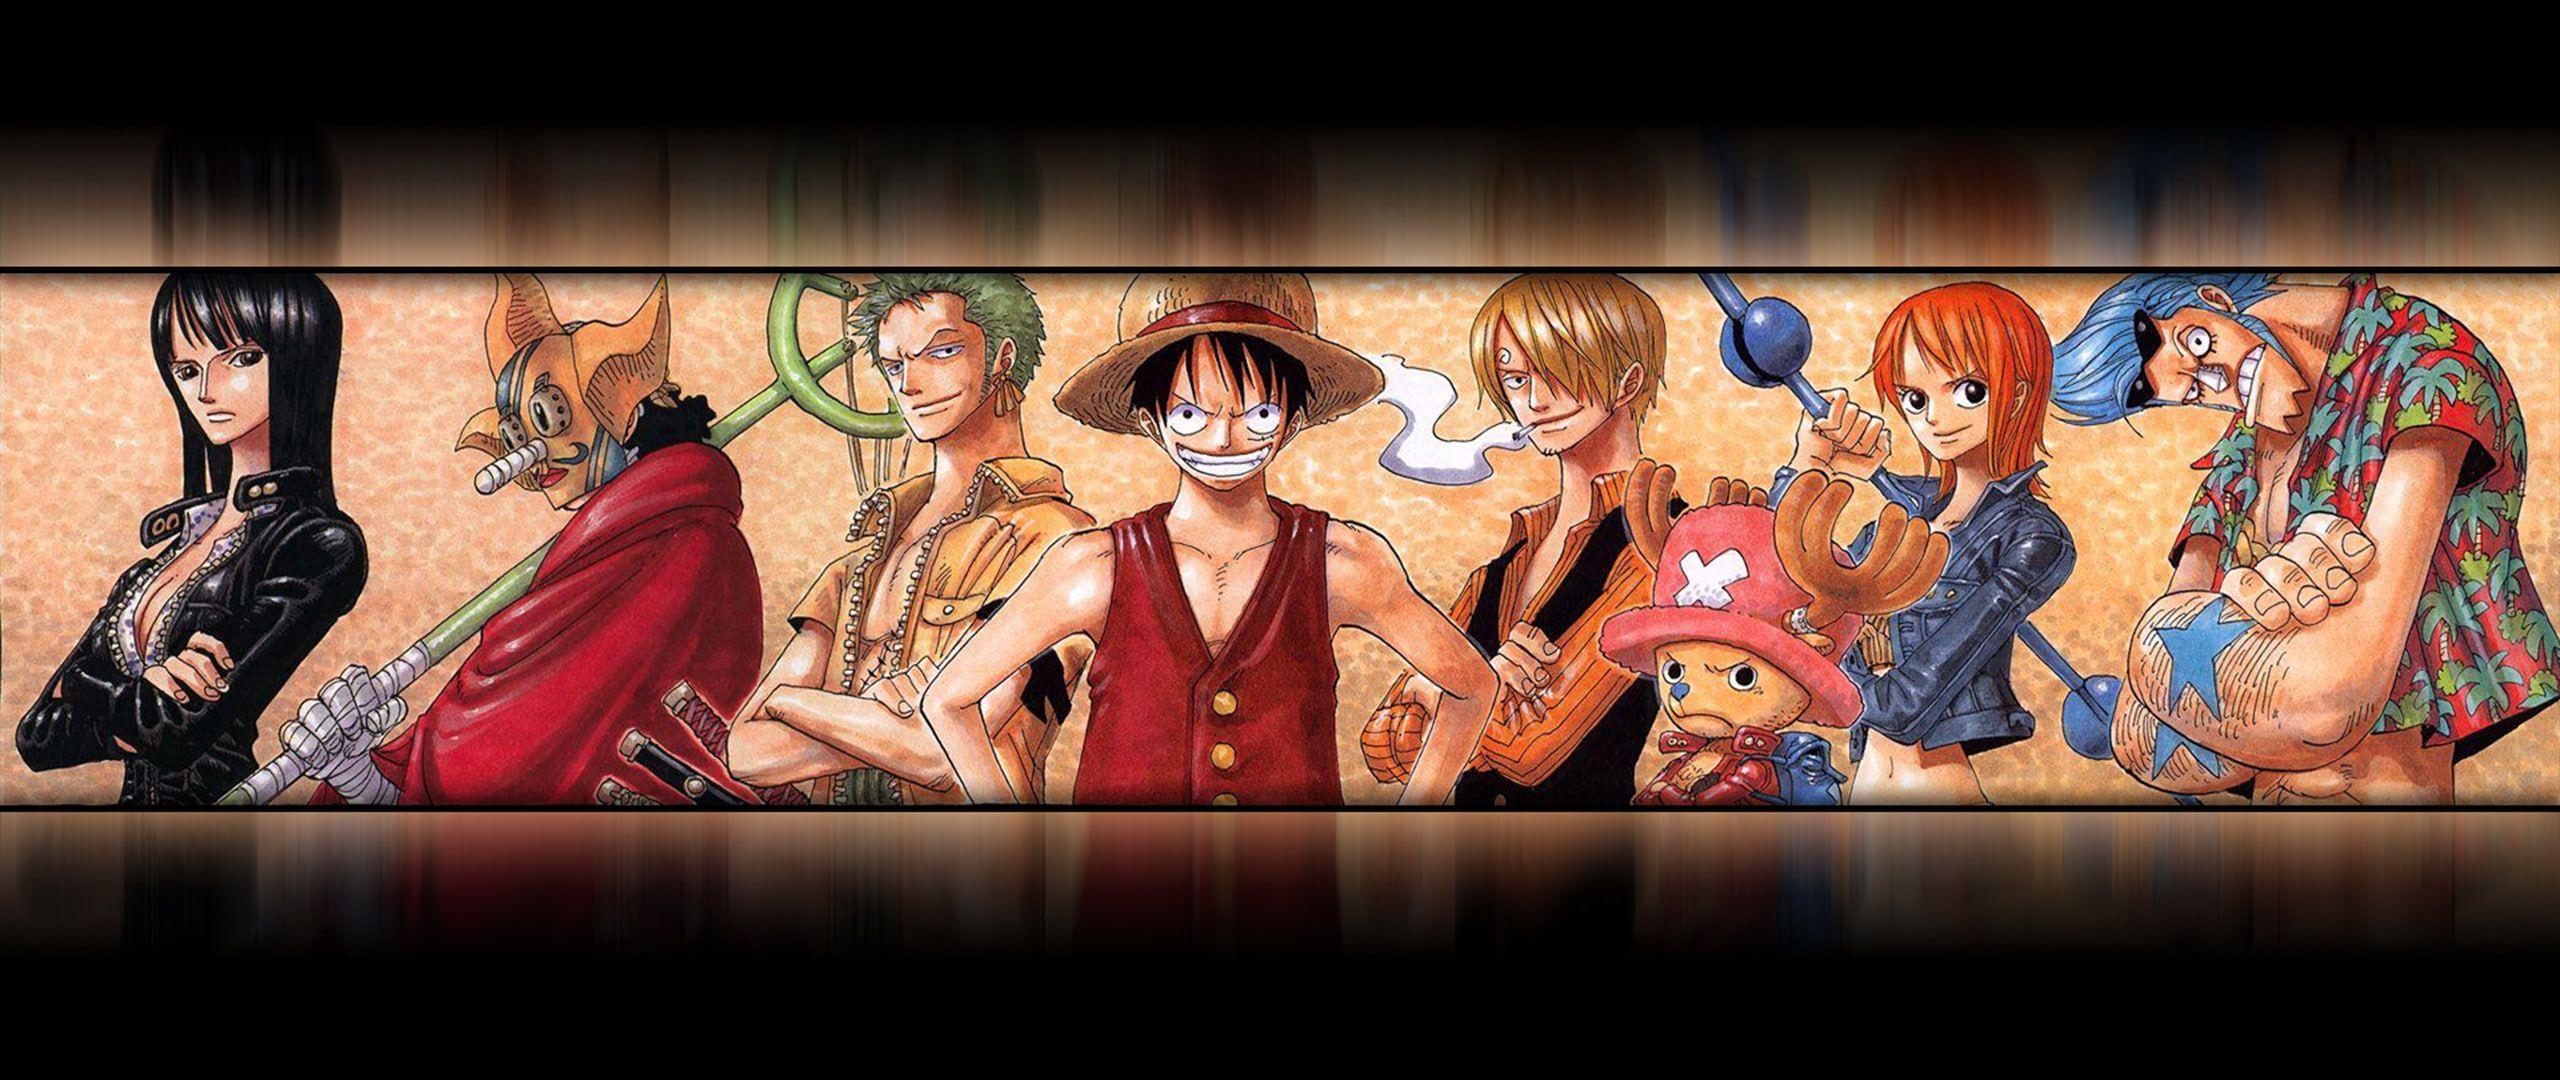 Ultra Wide One Piece 2k Wallpaper Hdwallpaper Desktop One Piece Anime Art One Piece Wallpaper Iphone 21 anime wallpaper hd for desktop